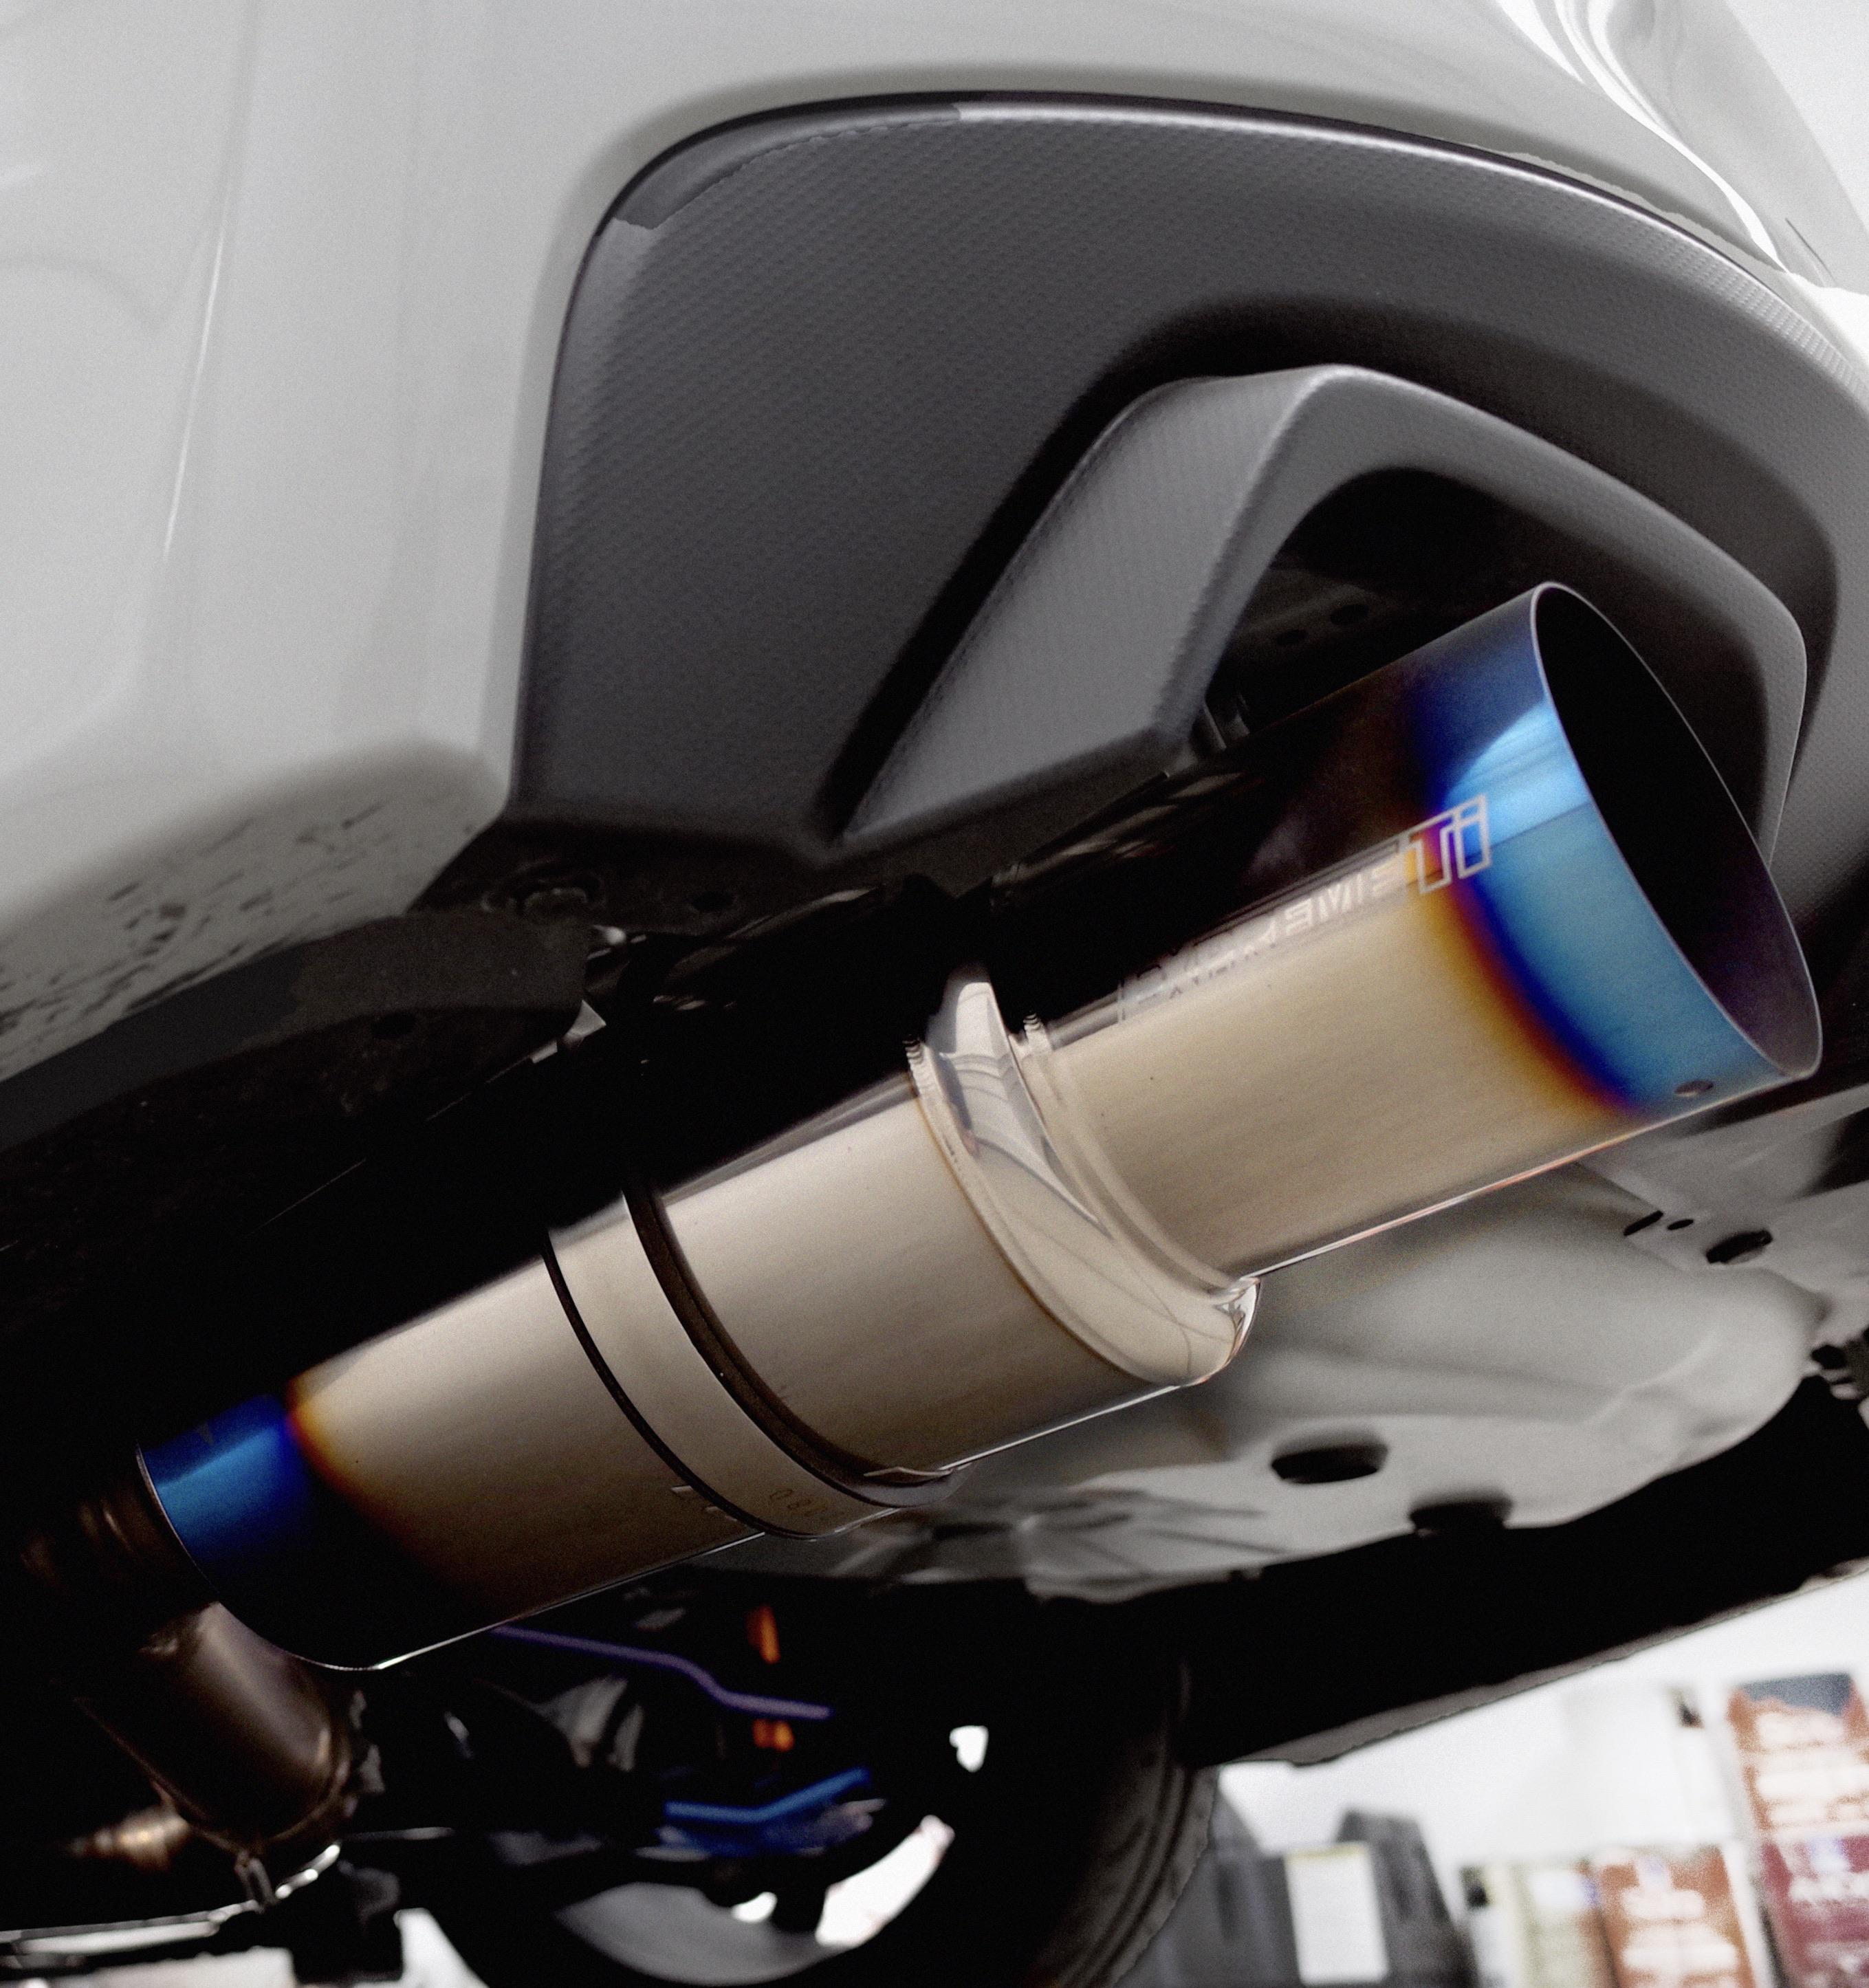 tomei expreme ti exhaust installed on